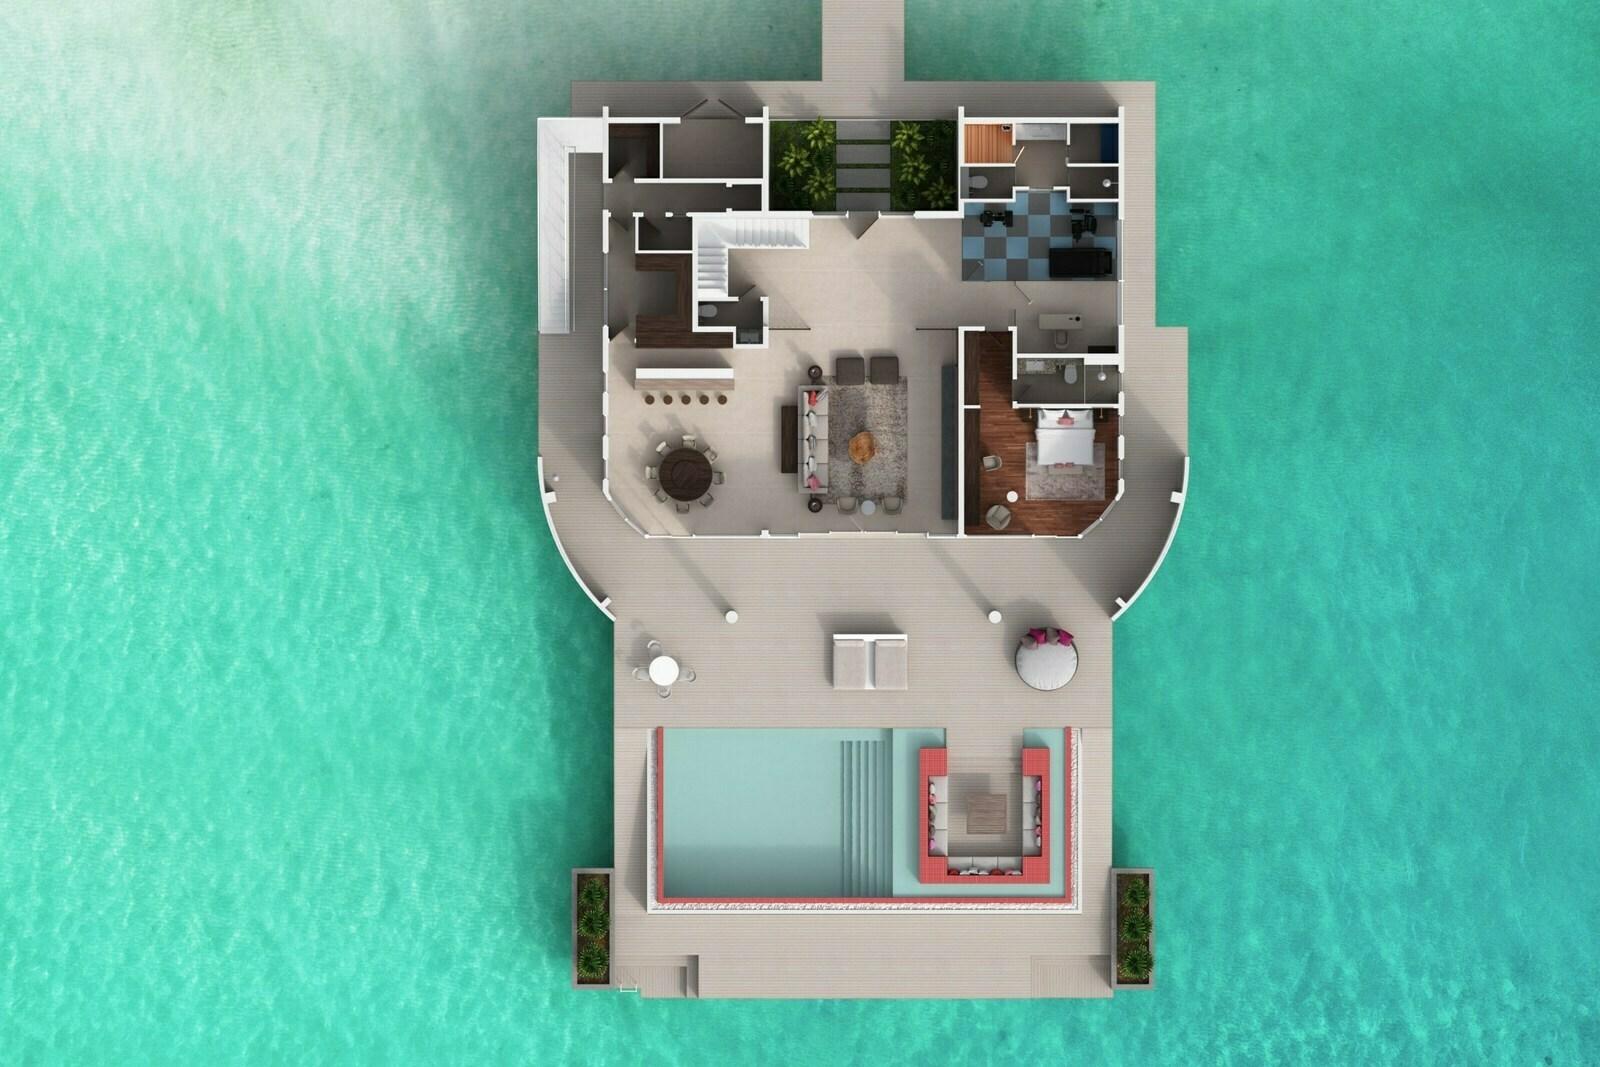 Мальдивы, отель LUX North Male Atoll, план-схема номера LUX* Overwater Retreat 3 Bedroom